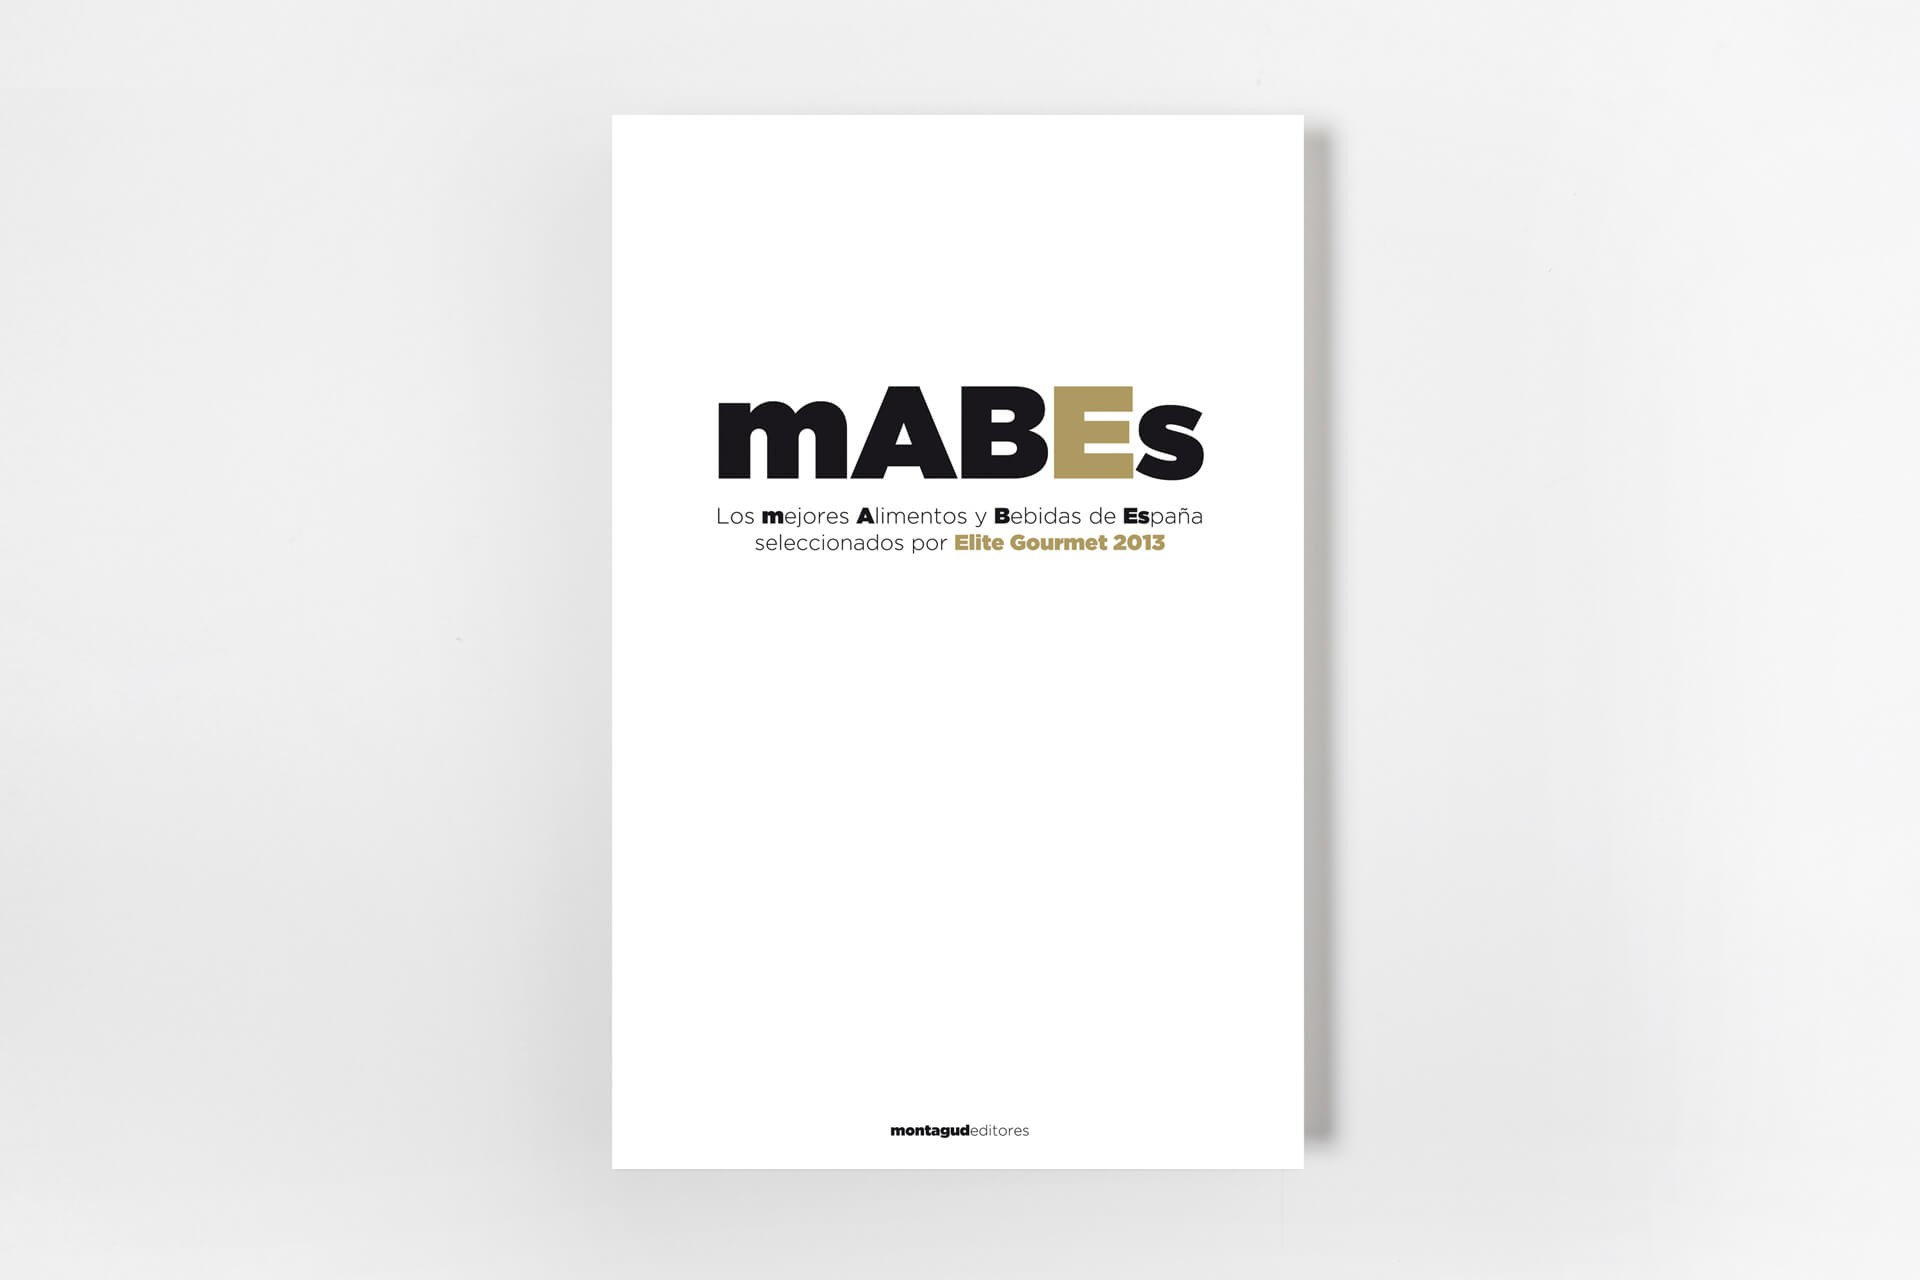 MABES_l